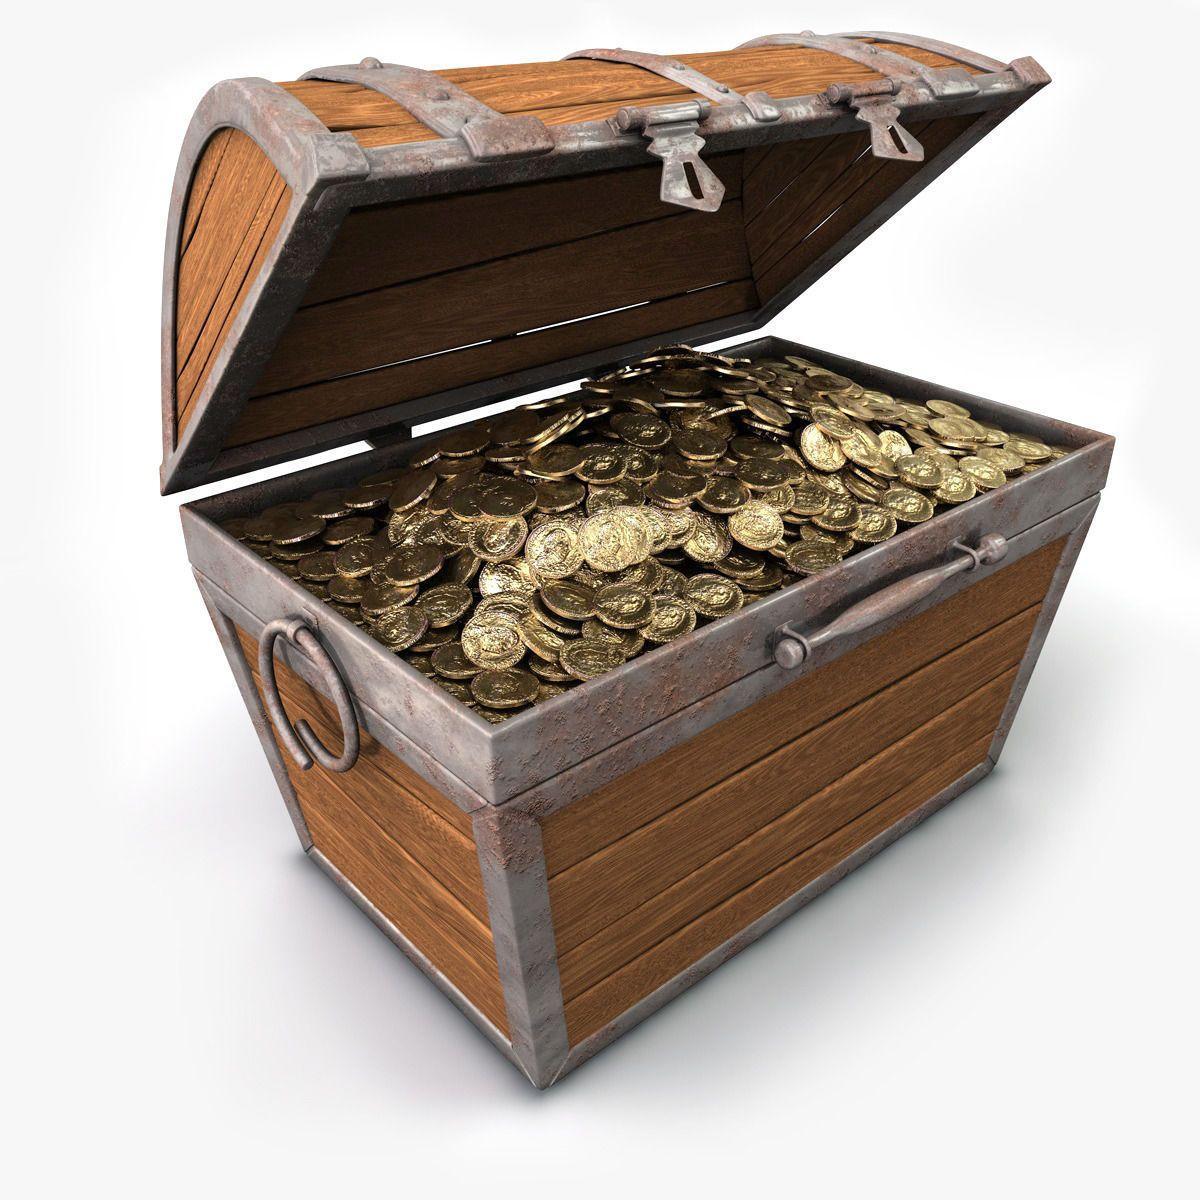 treasure chest with gold 3d model obj 3ds fbx c4d jpg 1200 1200